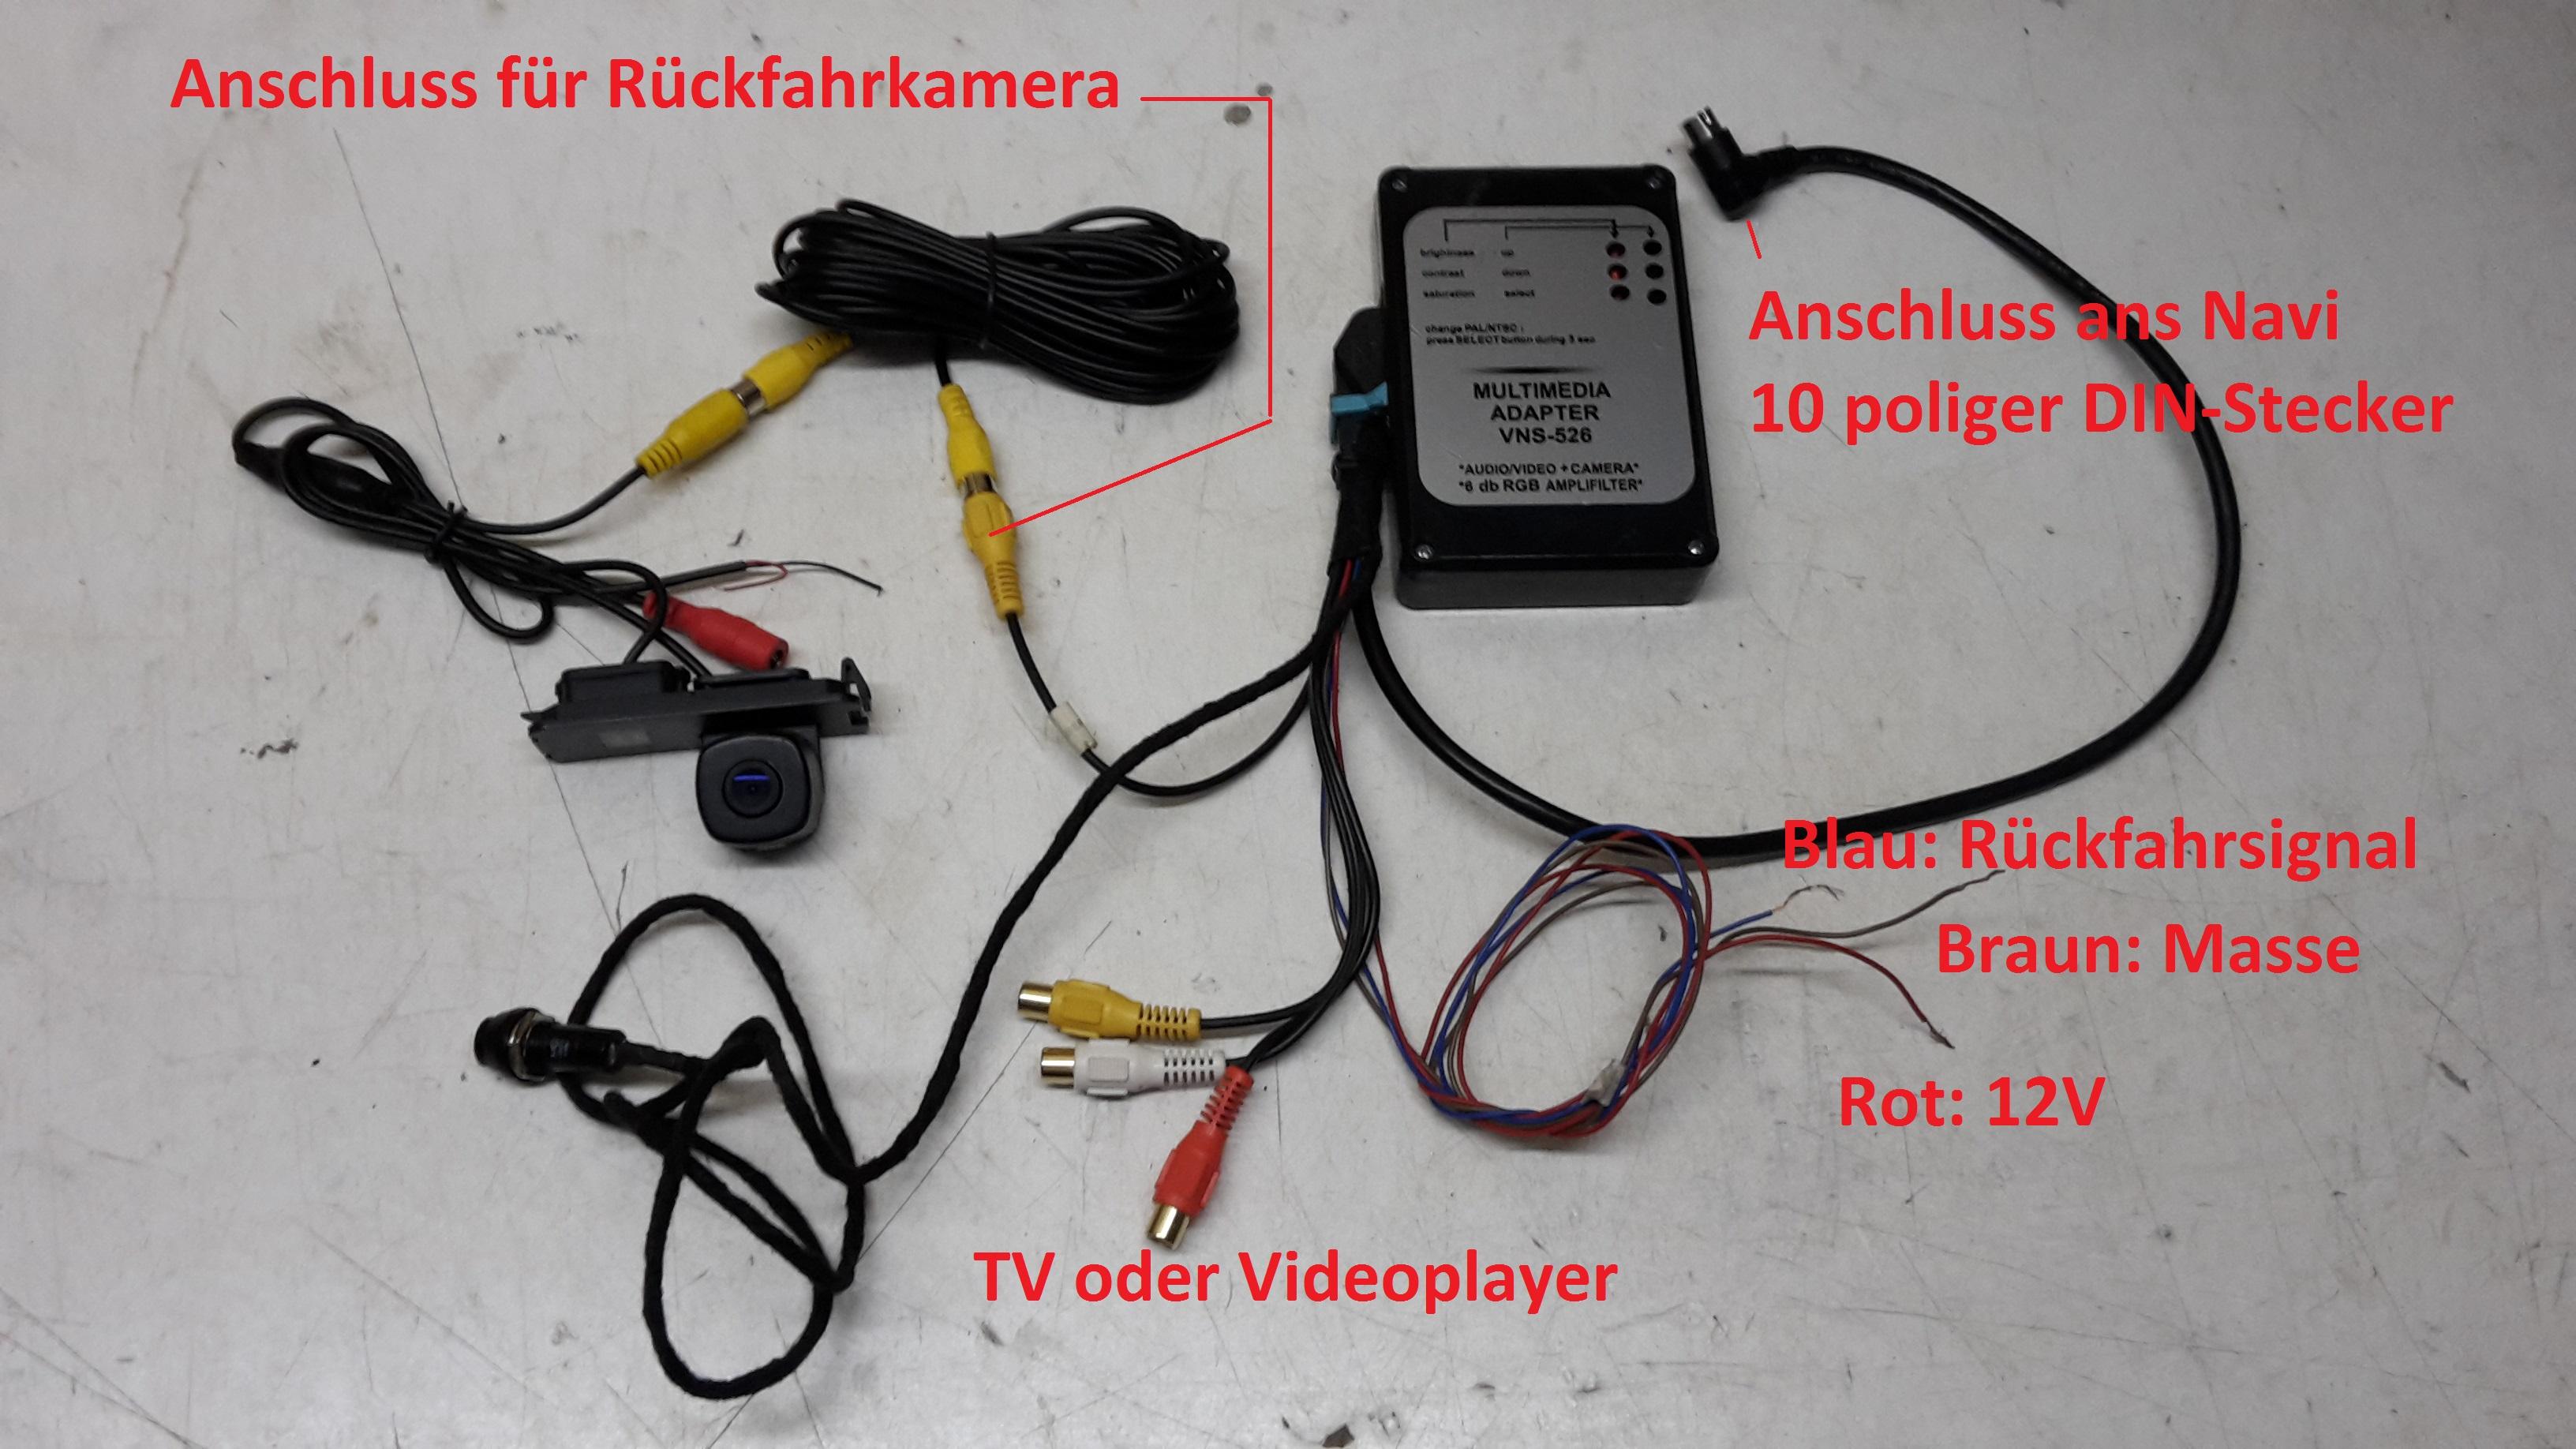 5893463a5a721_AnschlussdesMultimediaAdapters.jpg.d961a4c1e801dcac137e6940ca66e280.jpg